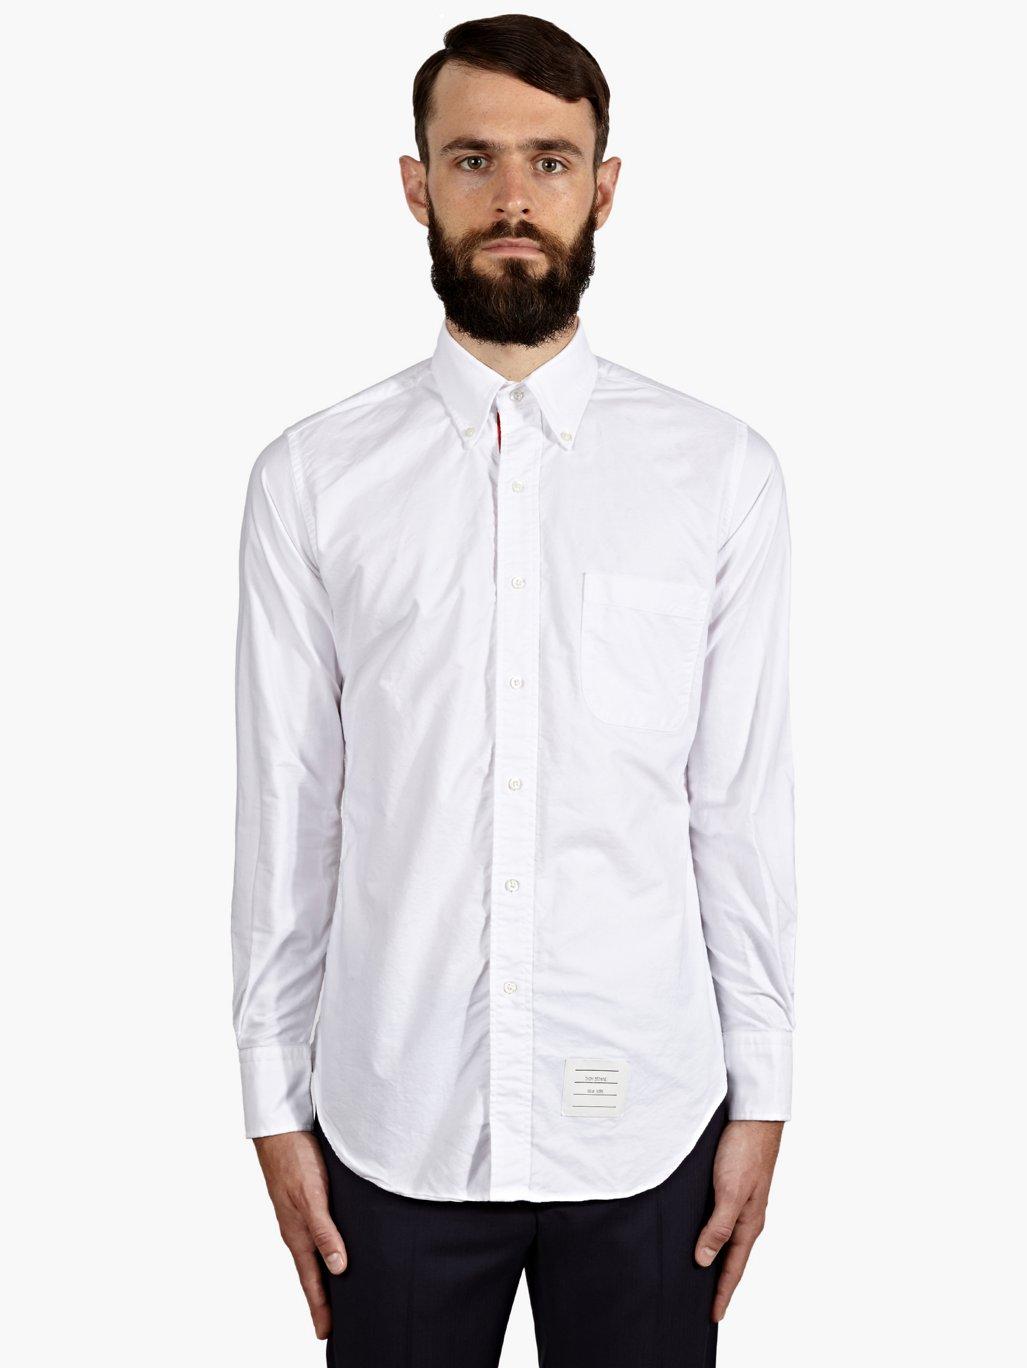 Thom browne white shirt c o w b o y z o o m for Thom browne white shirt